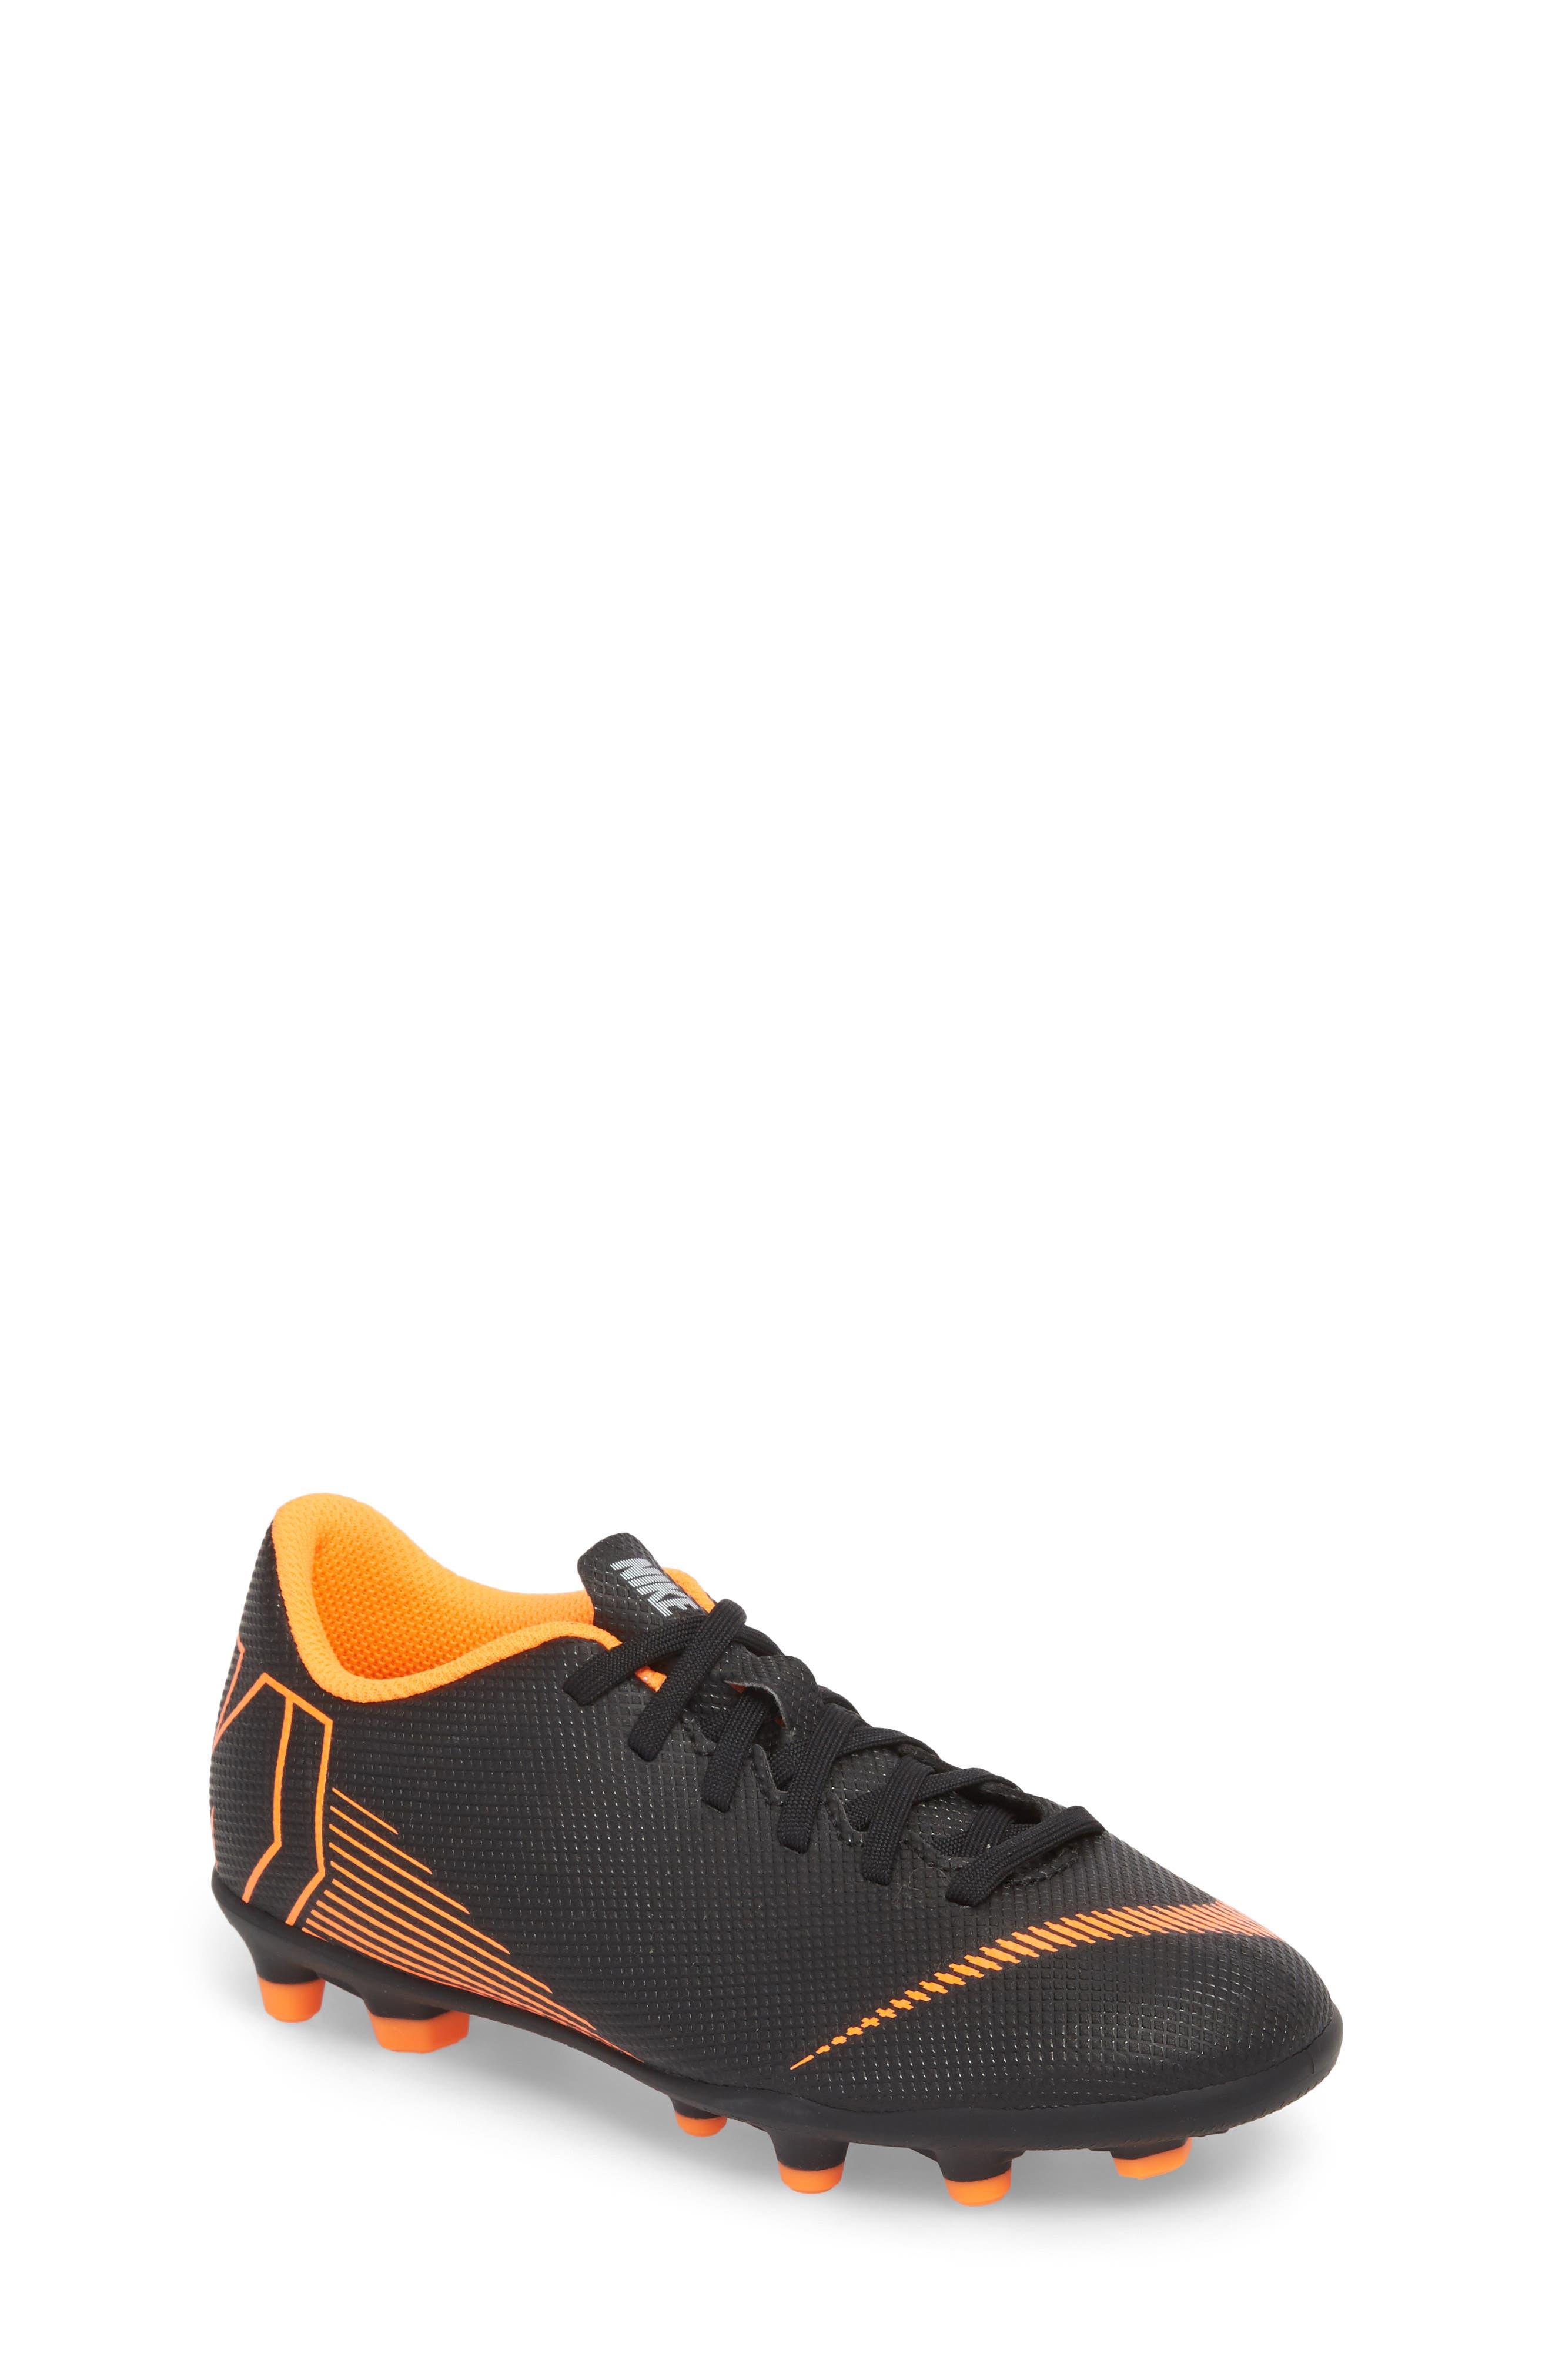 Vapor XII Club Multi Ground Soccer Shoe,                         Main,                         color, Black/ Total Orange/ White